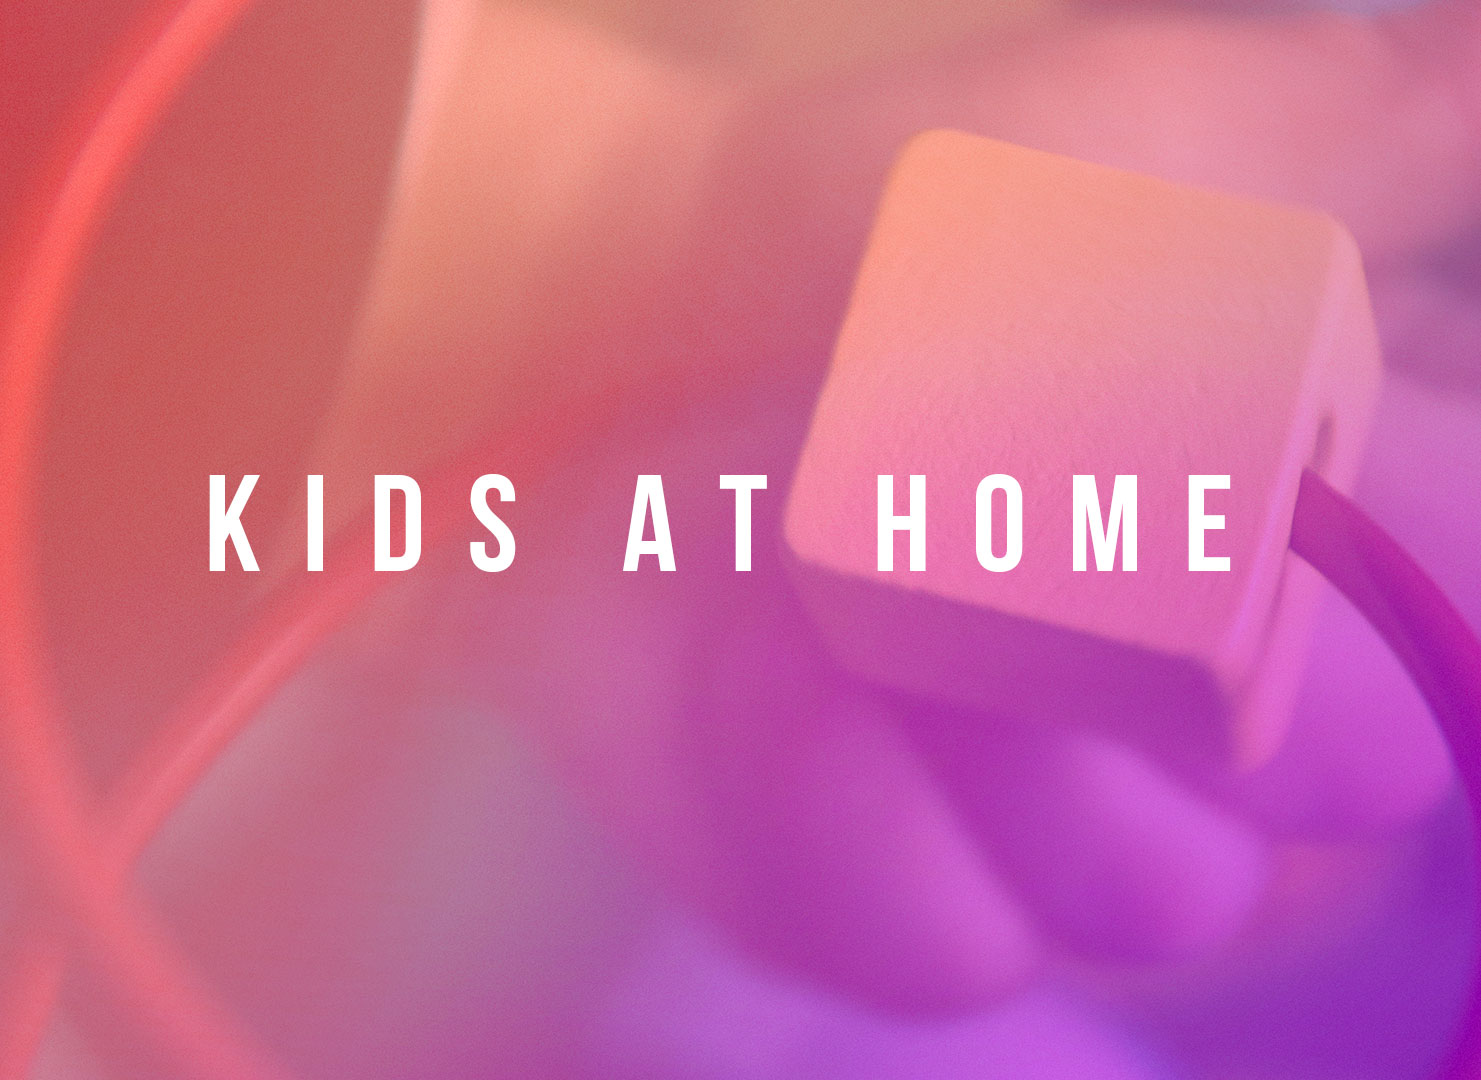 kidsathome_mobile